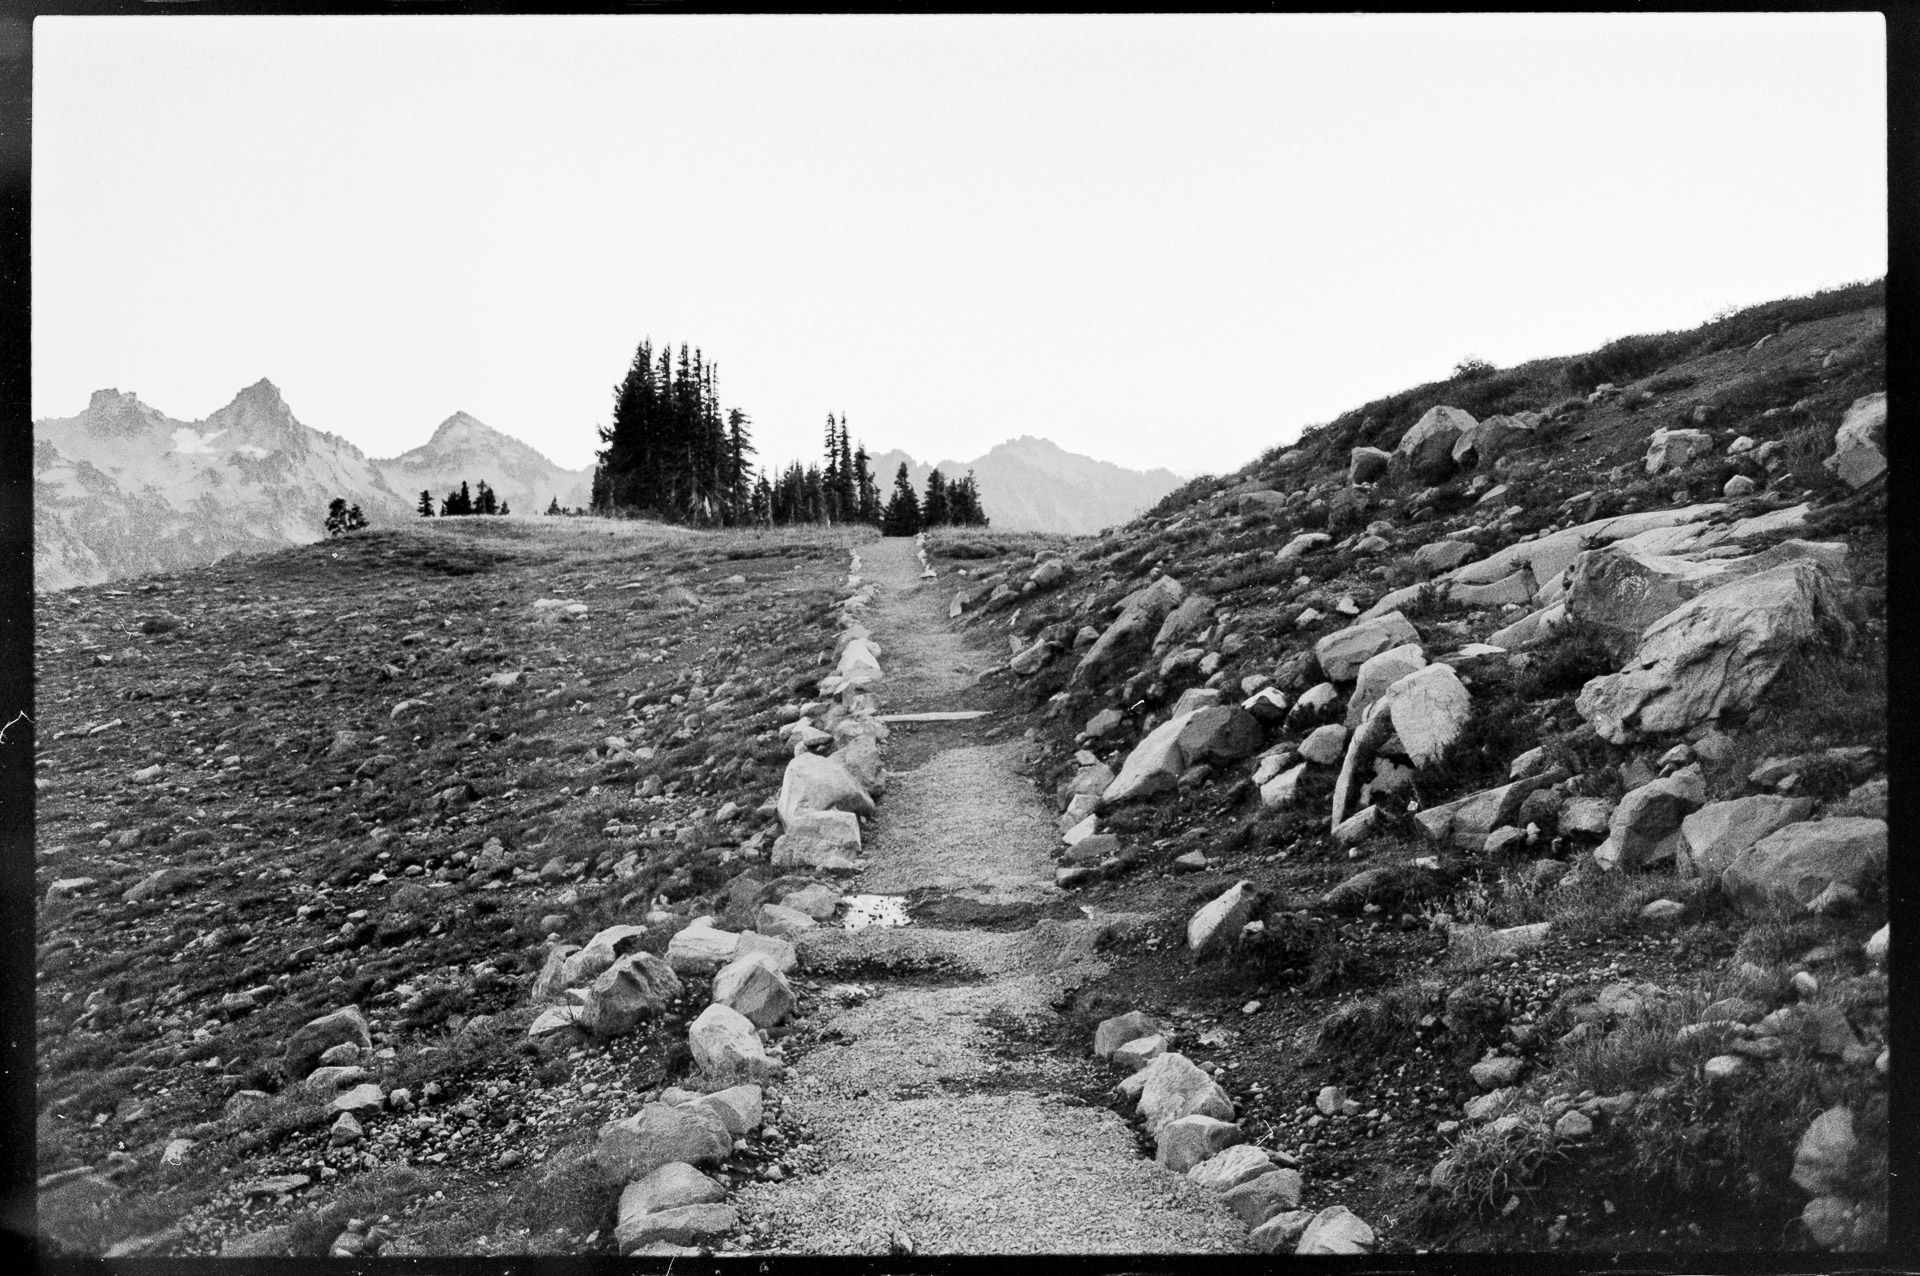 Walk Mt Ranier—Chris-Page-Art-6.jpg